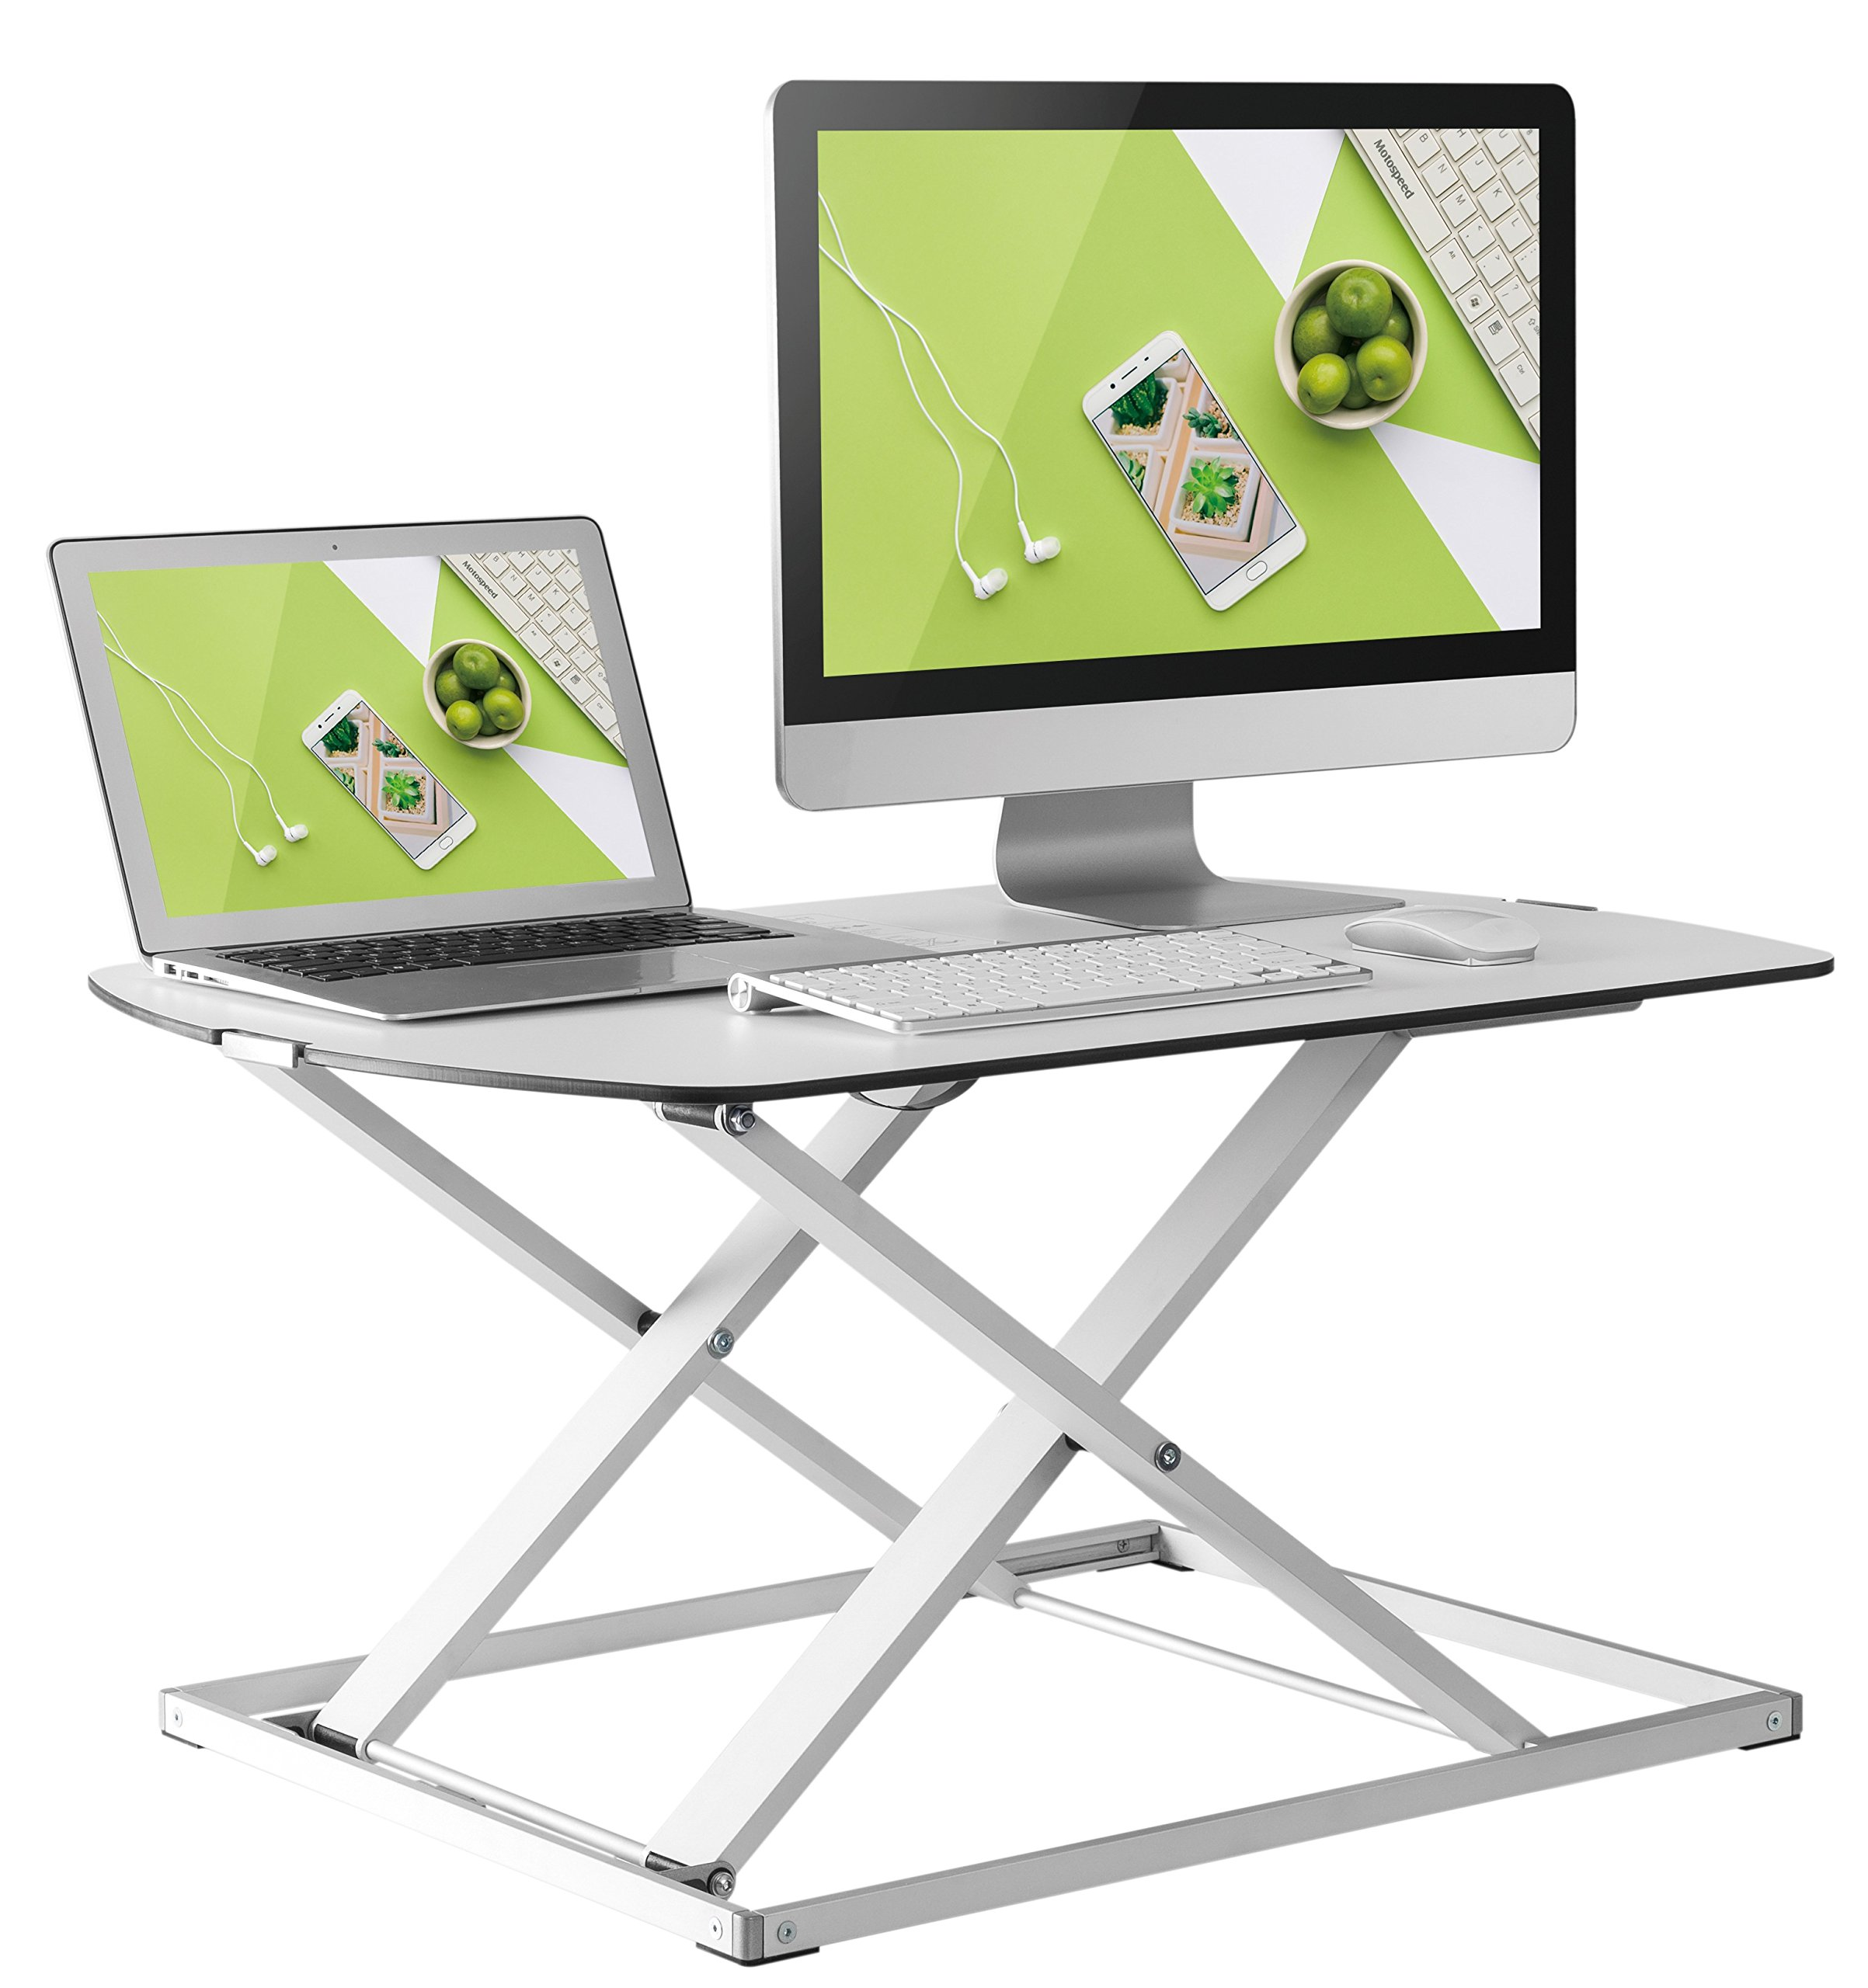 Husky Mounts Height Adjustable Standing Desk - Fully Assembled